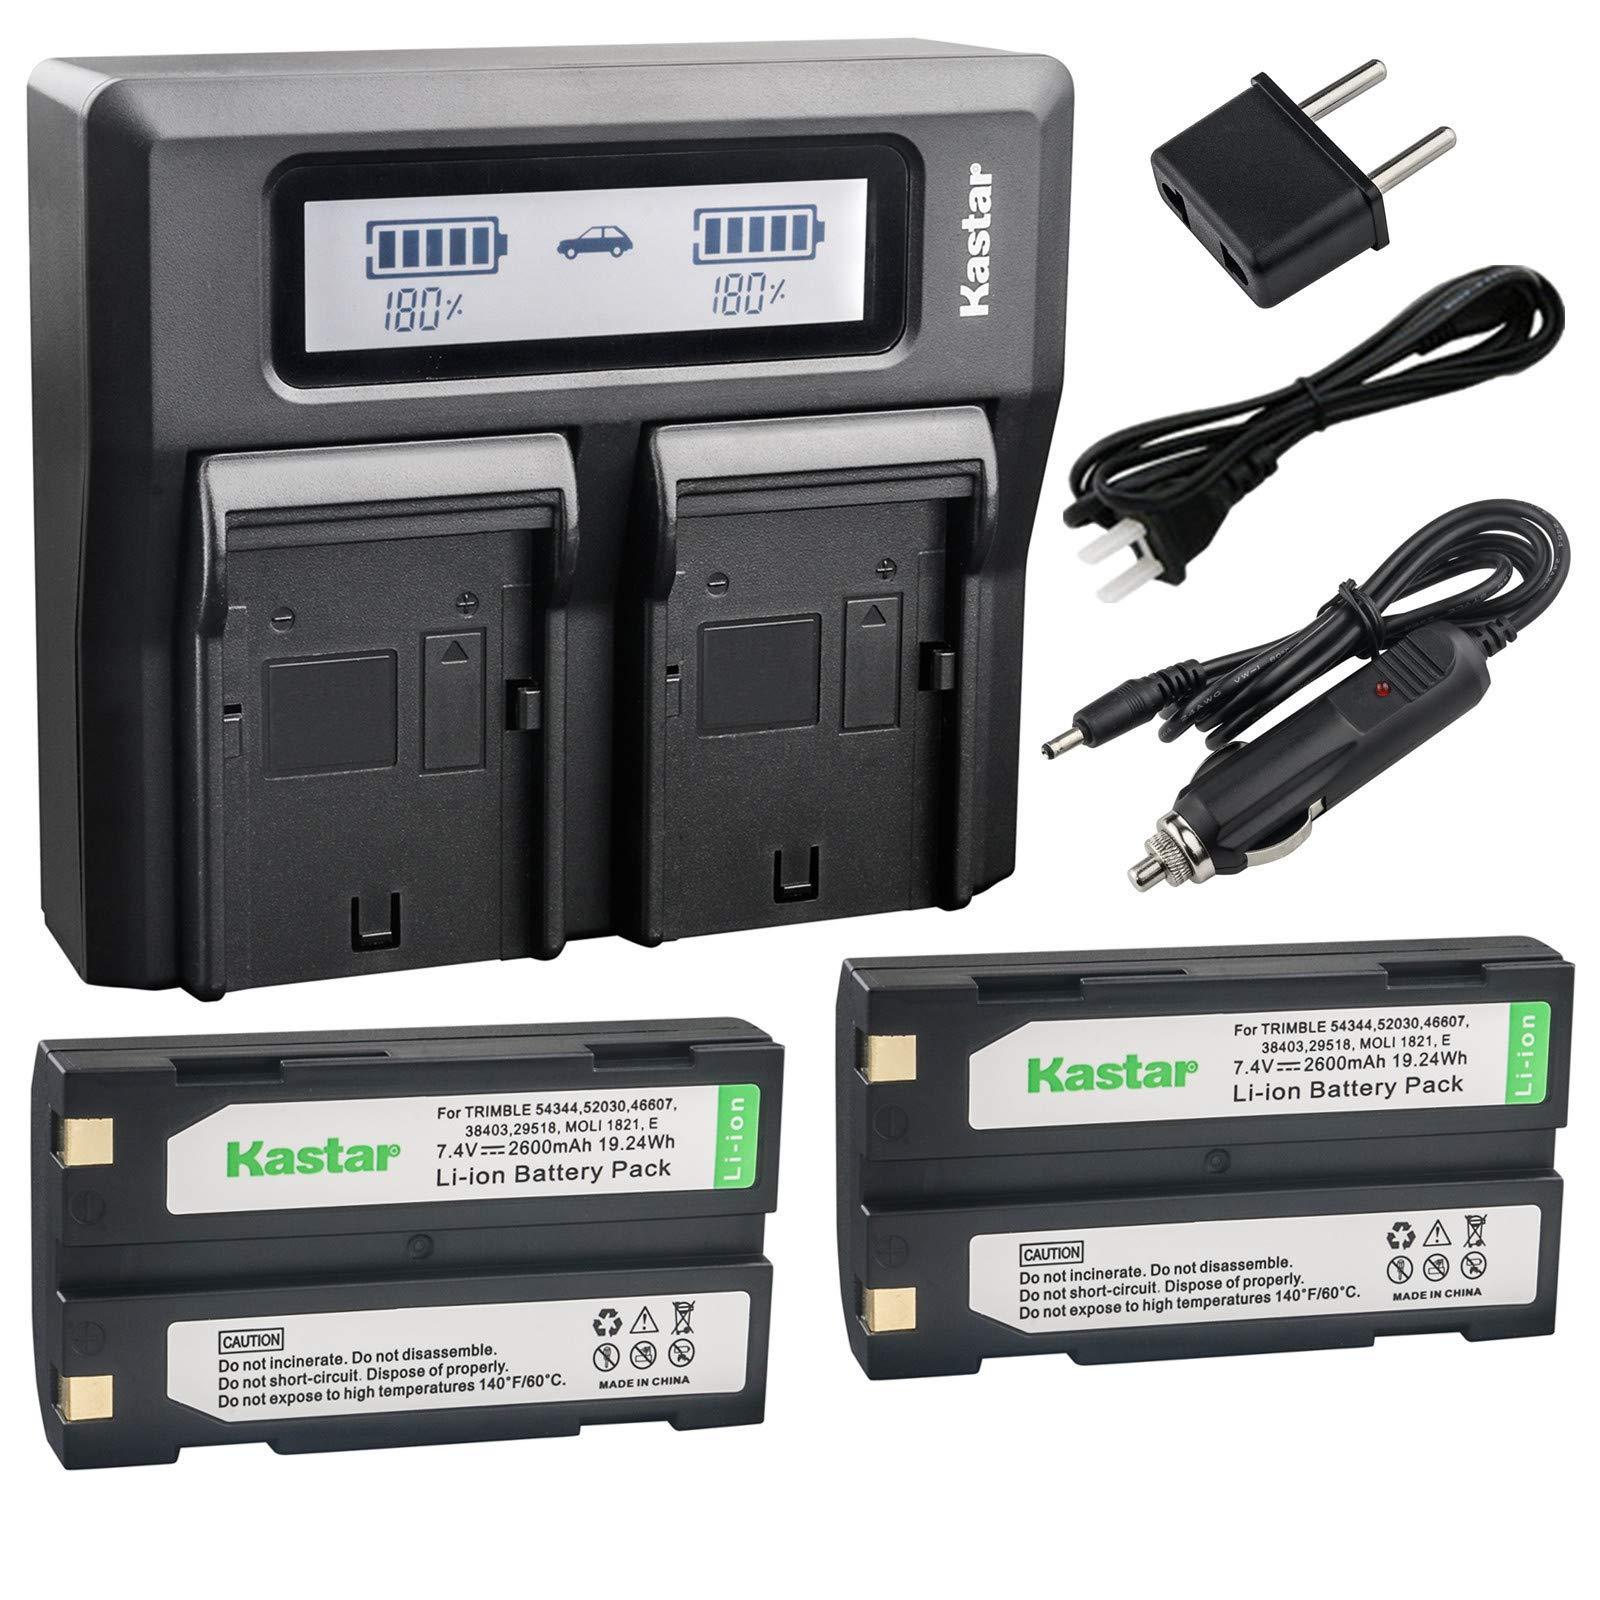 Kastar Fast Dual LCD Charger + 2x Battery Replacement for Pentax Ei-D-Li1 EI-D-BC1 EI-2000, Trimble 29518 46607 52030 54344 38403 5700 5800 R6 R7 R8 GNSS TR-R8 GPS, HP PhotoSmart C8873A 912 C912C912XI